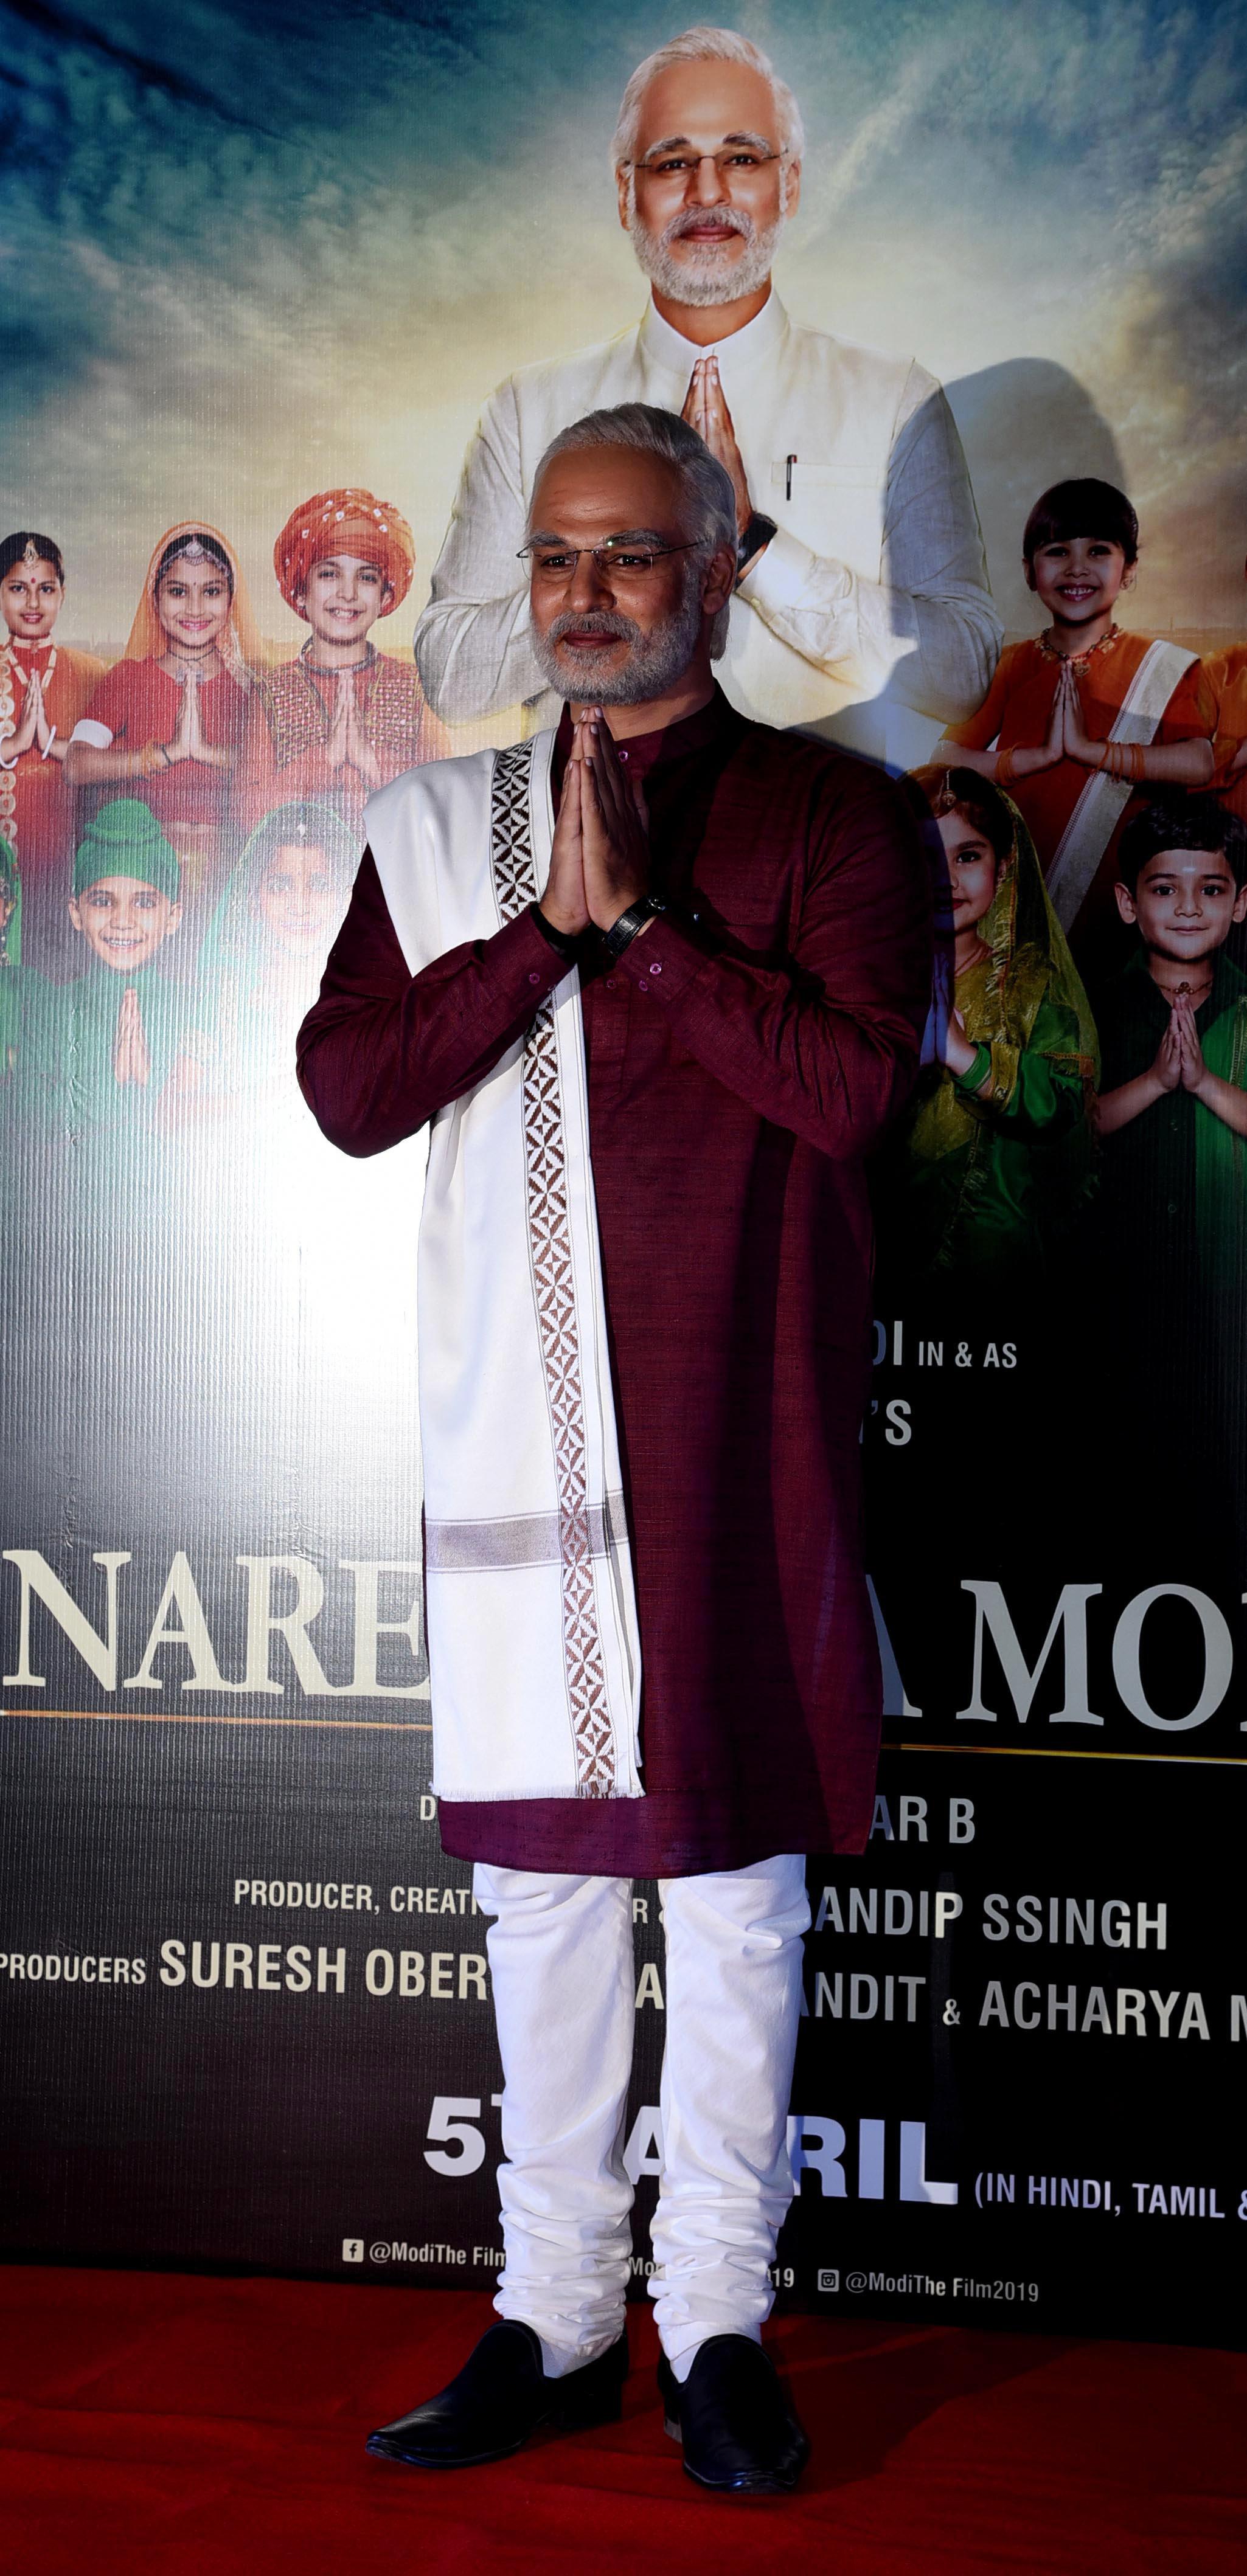 Supreme Court Dismisses Plea Seeking Stay On Modi Biopic, Says Time Wasted On